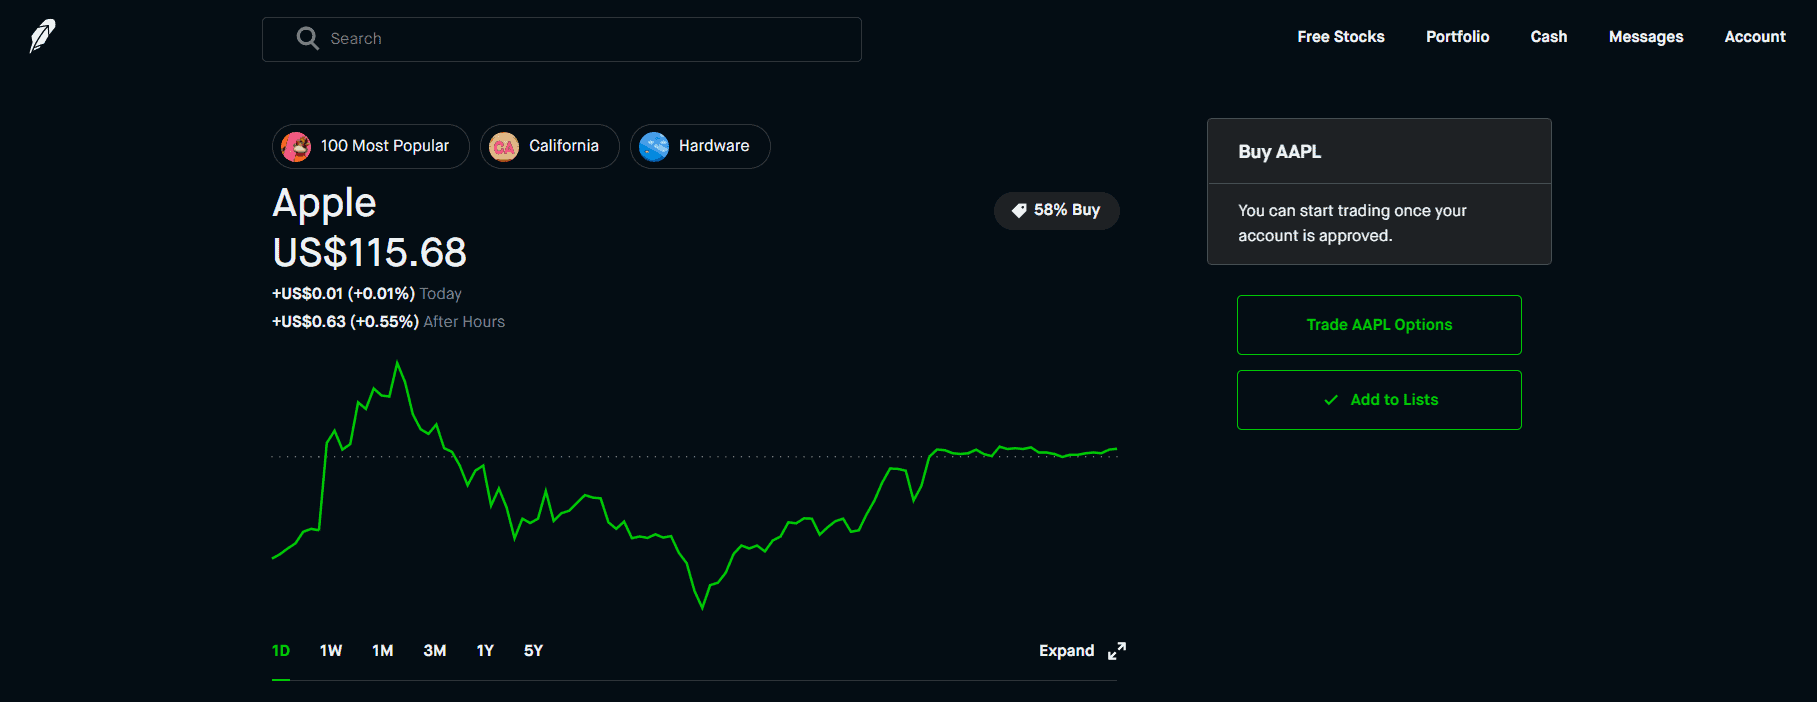 Robinhood's stock browser